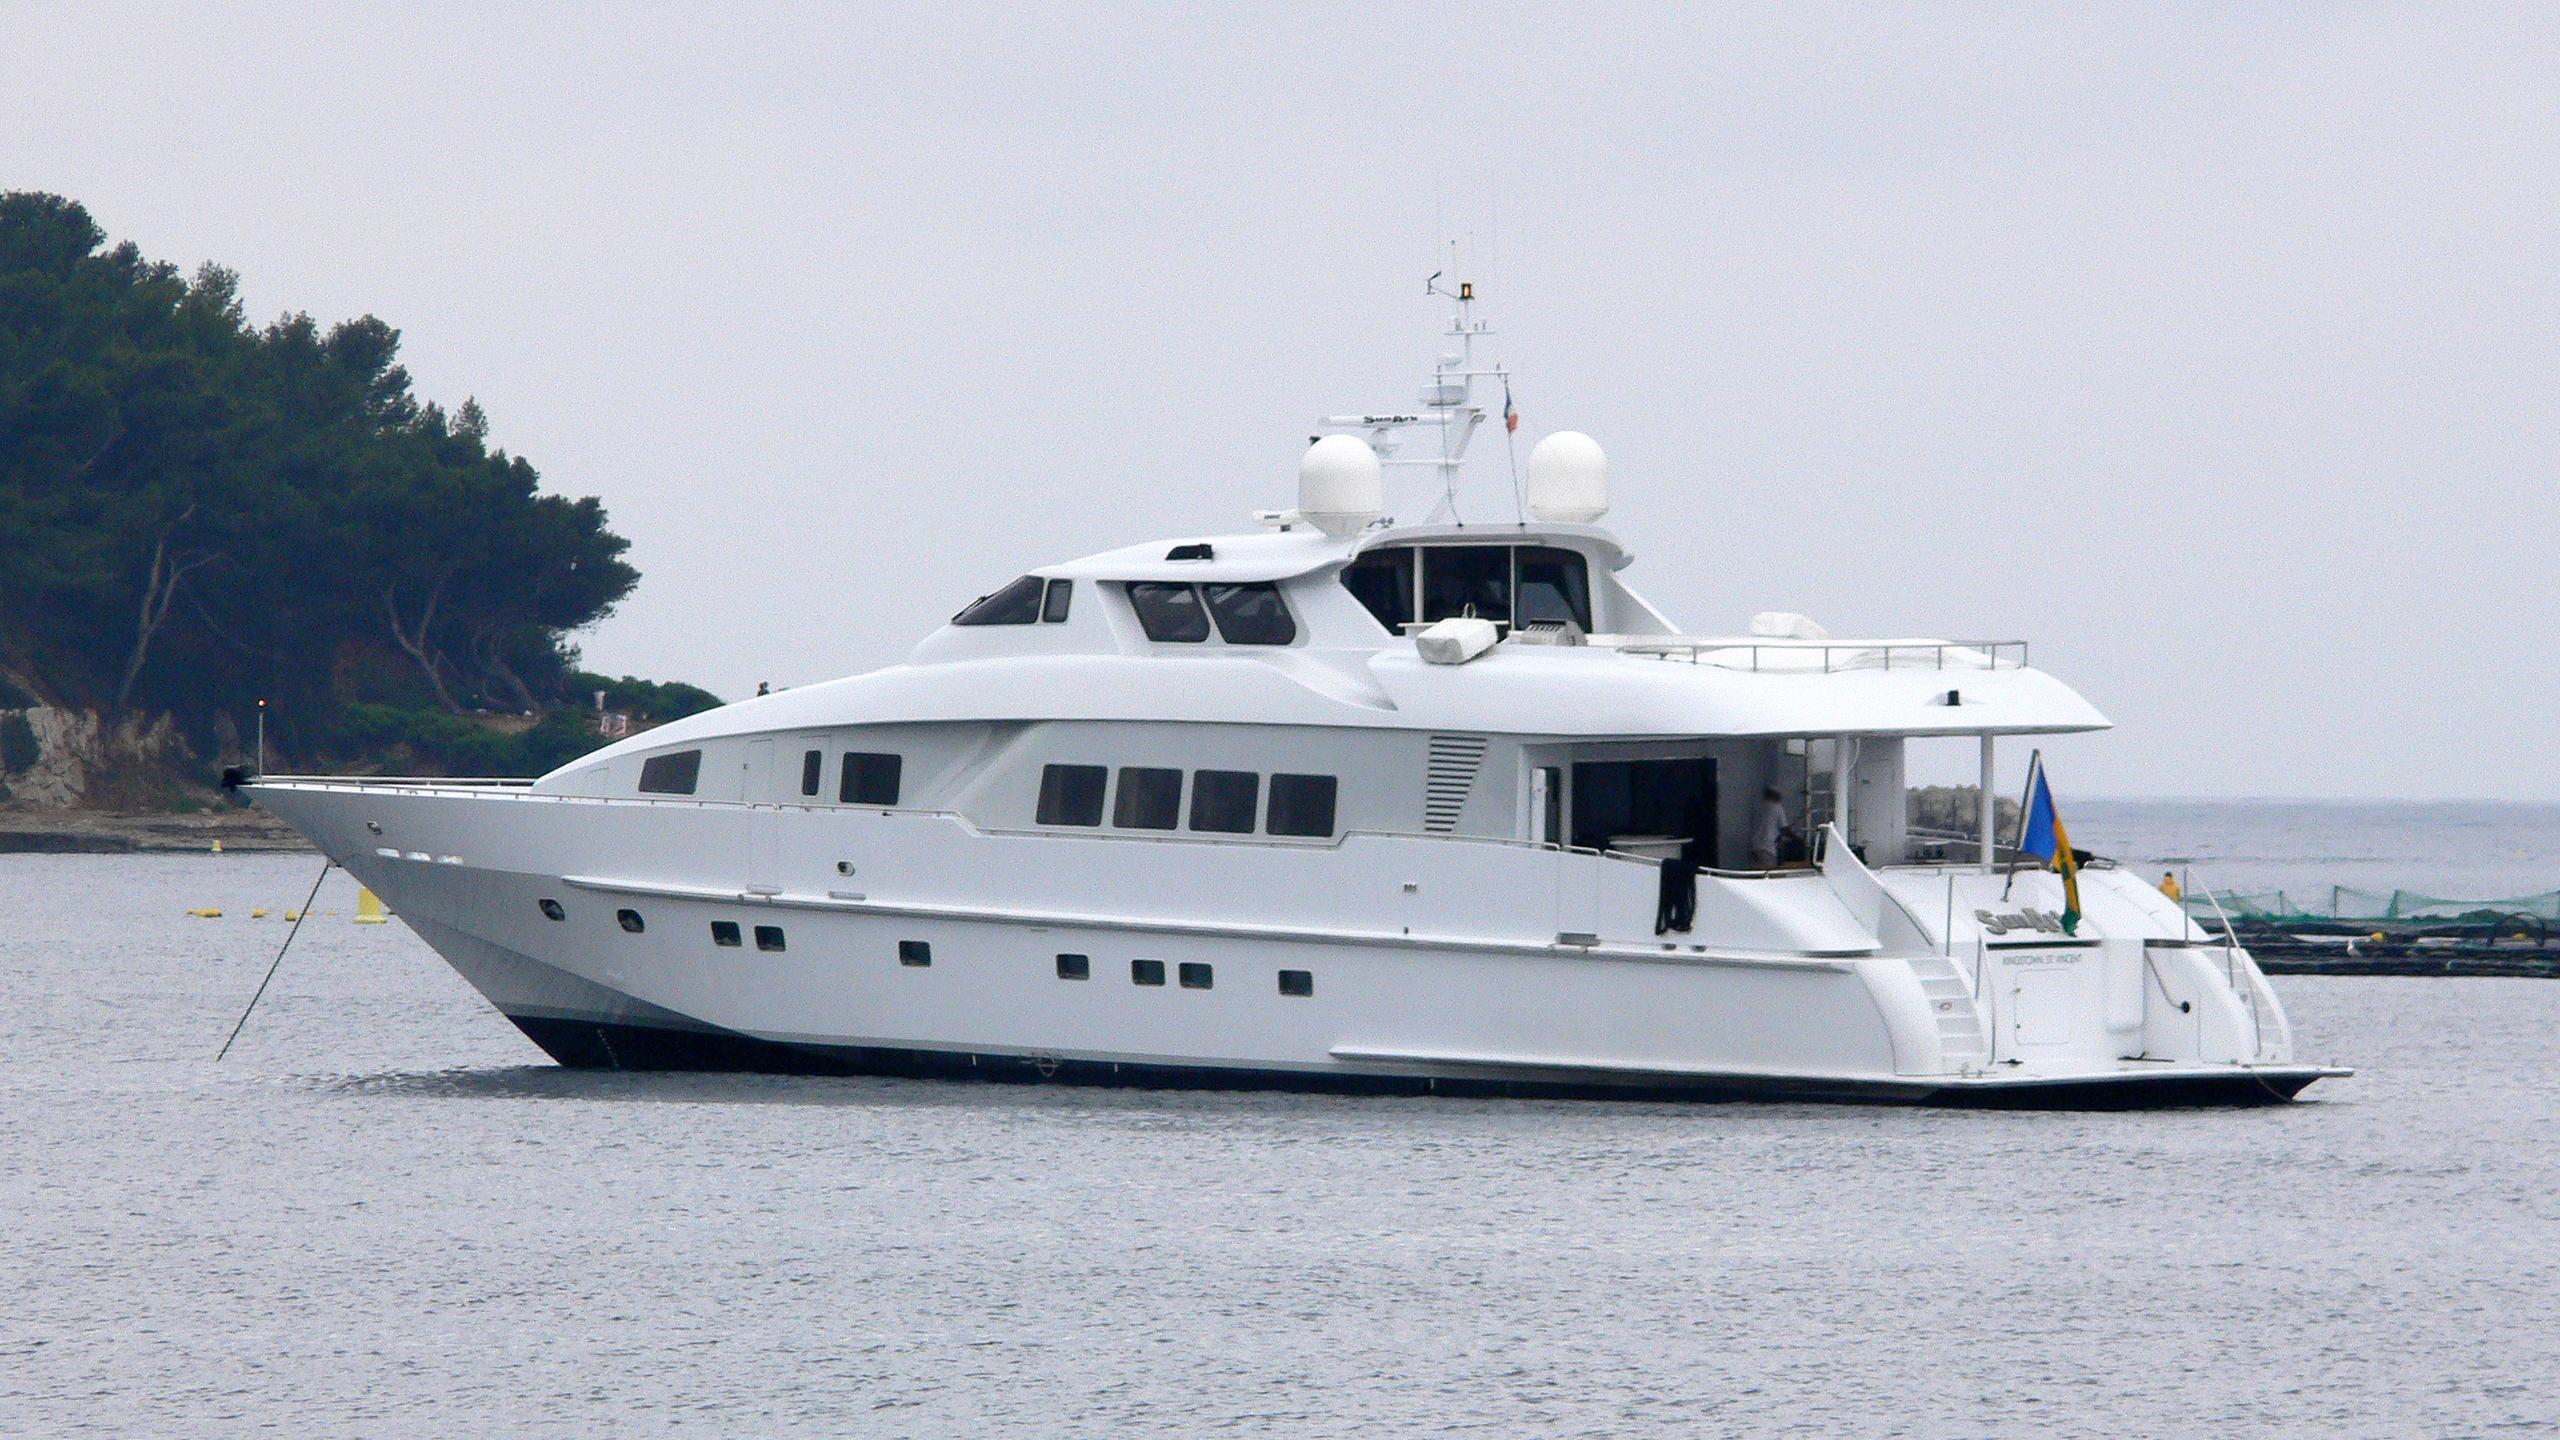 sun-ark-motor-yacht-heesen-1995-37m-stern